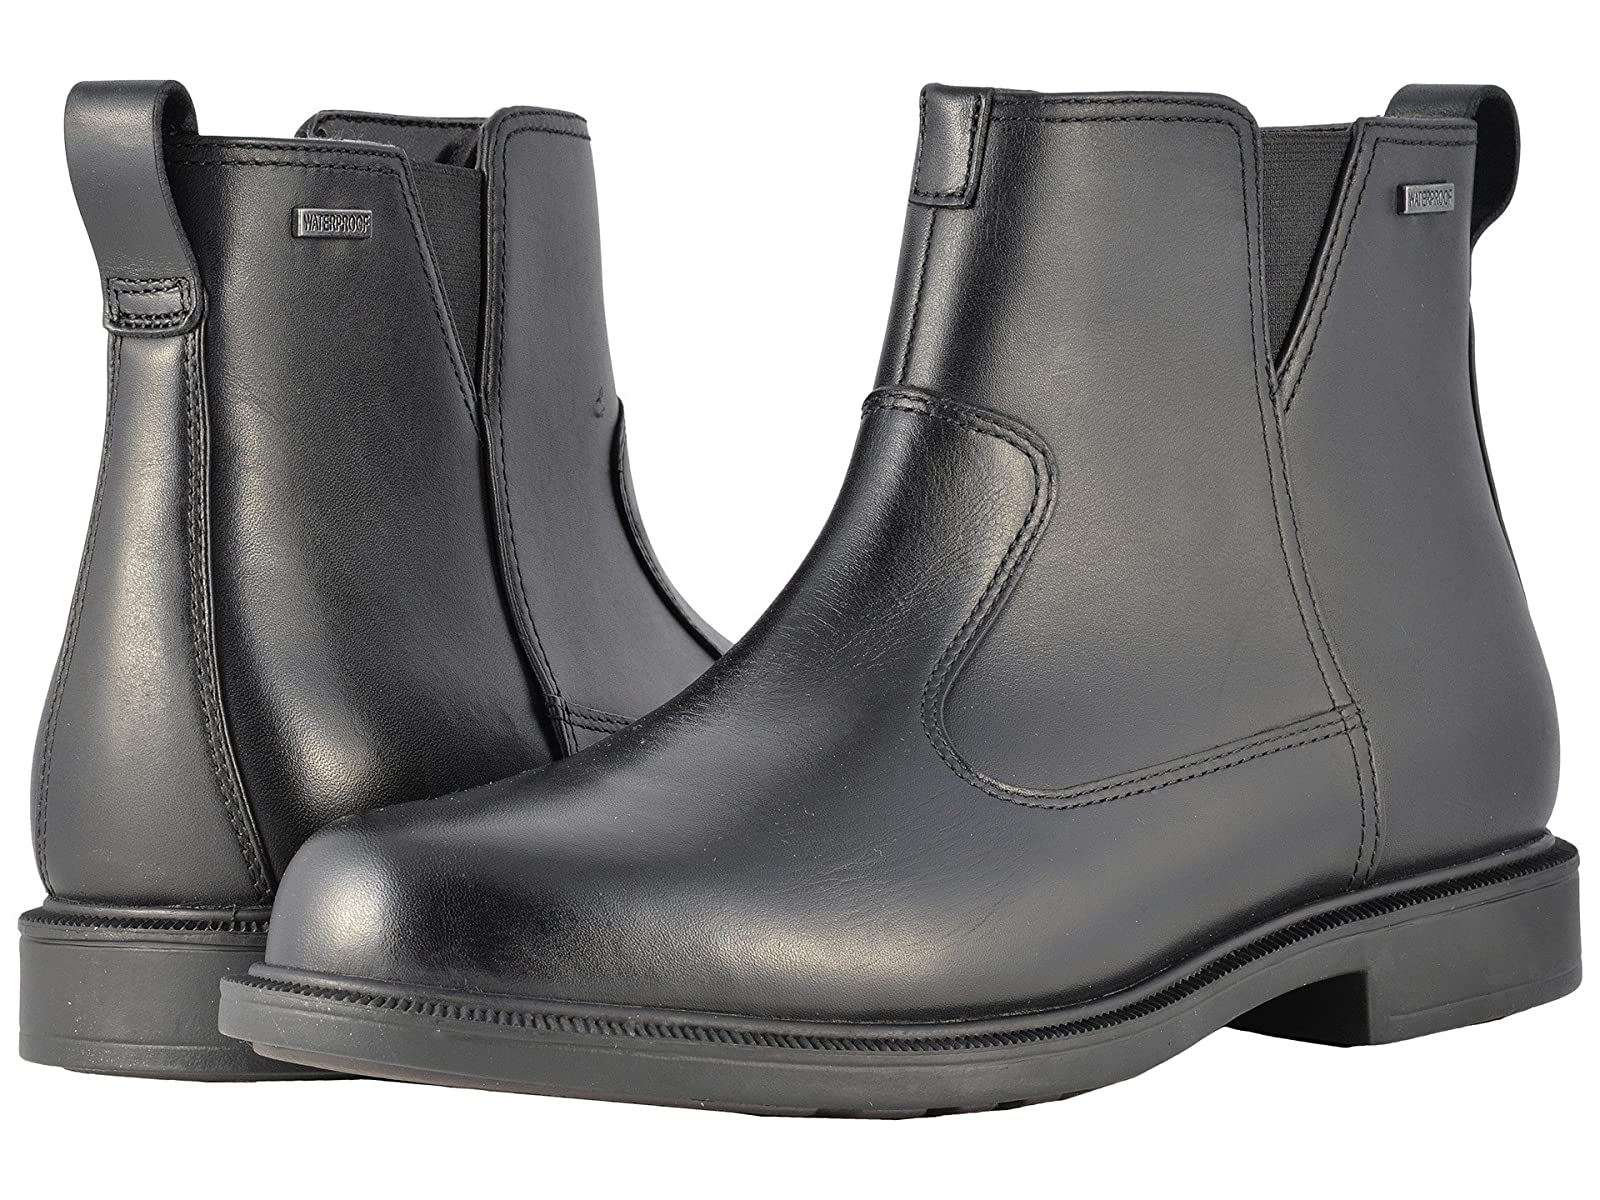 Dunham James WaterproofAffordable and distinctive shoes